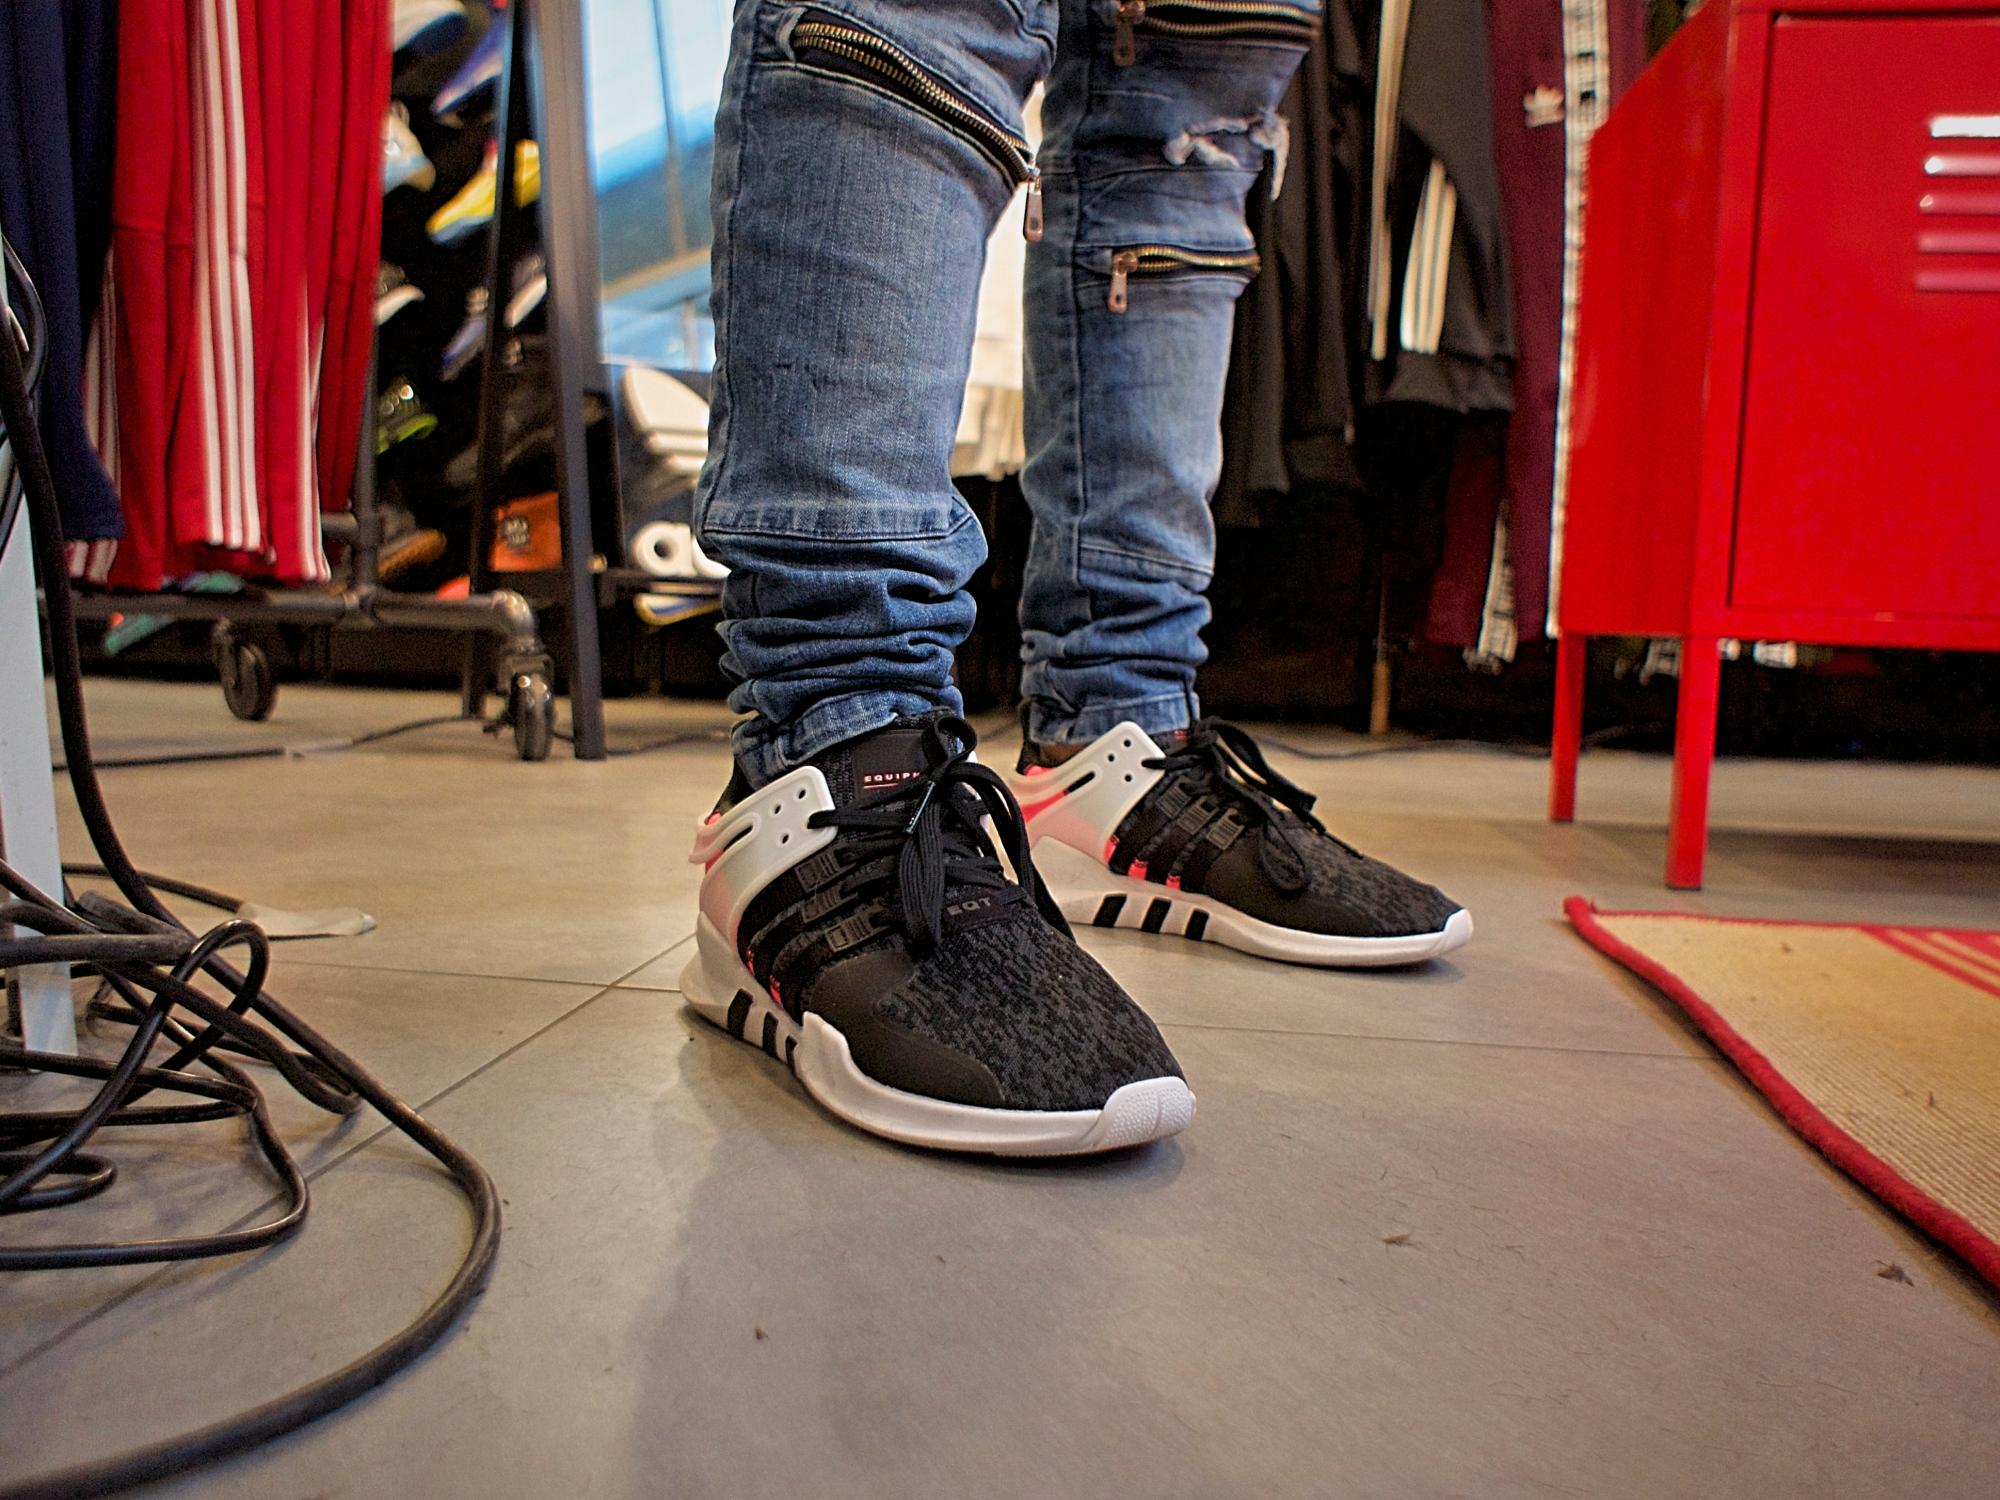 Adidas Eqt Adv Foot Locker